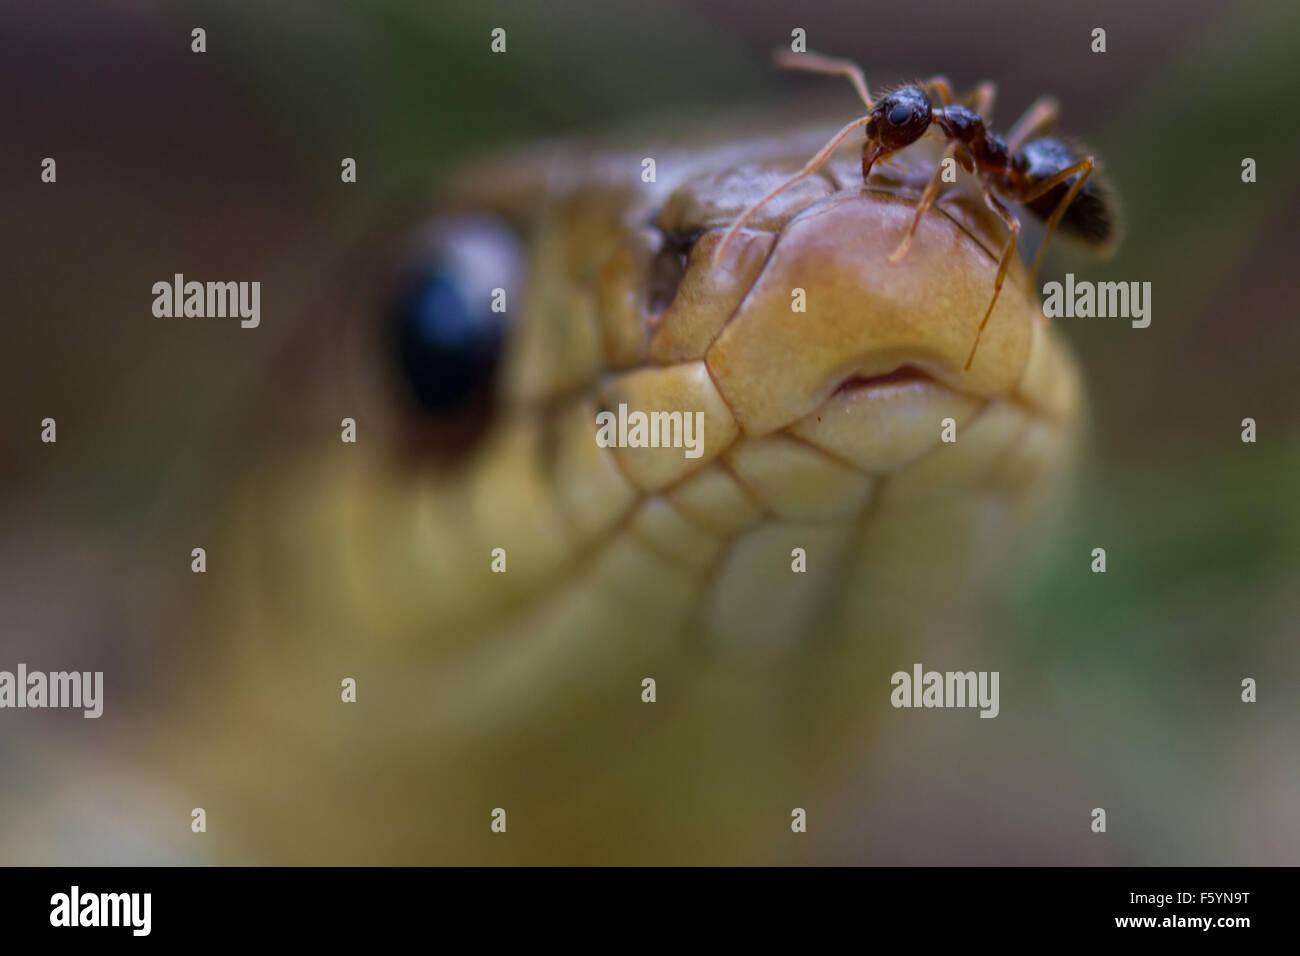 ant on snake - Stock Image